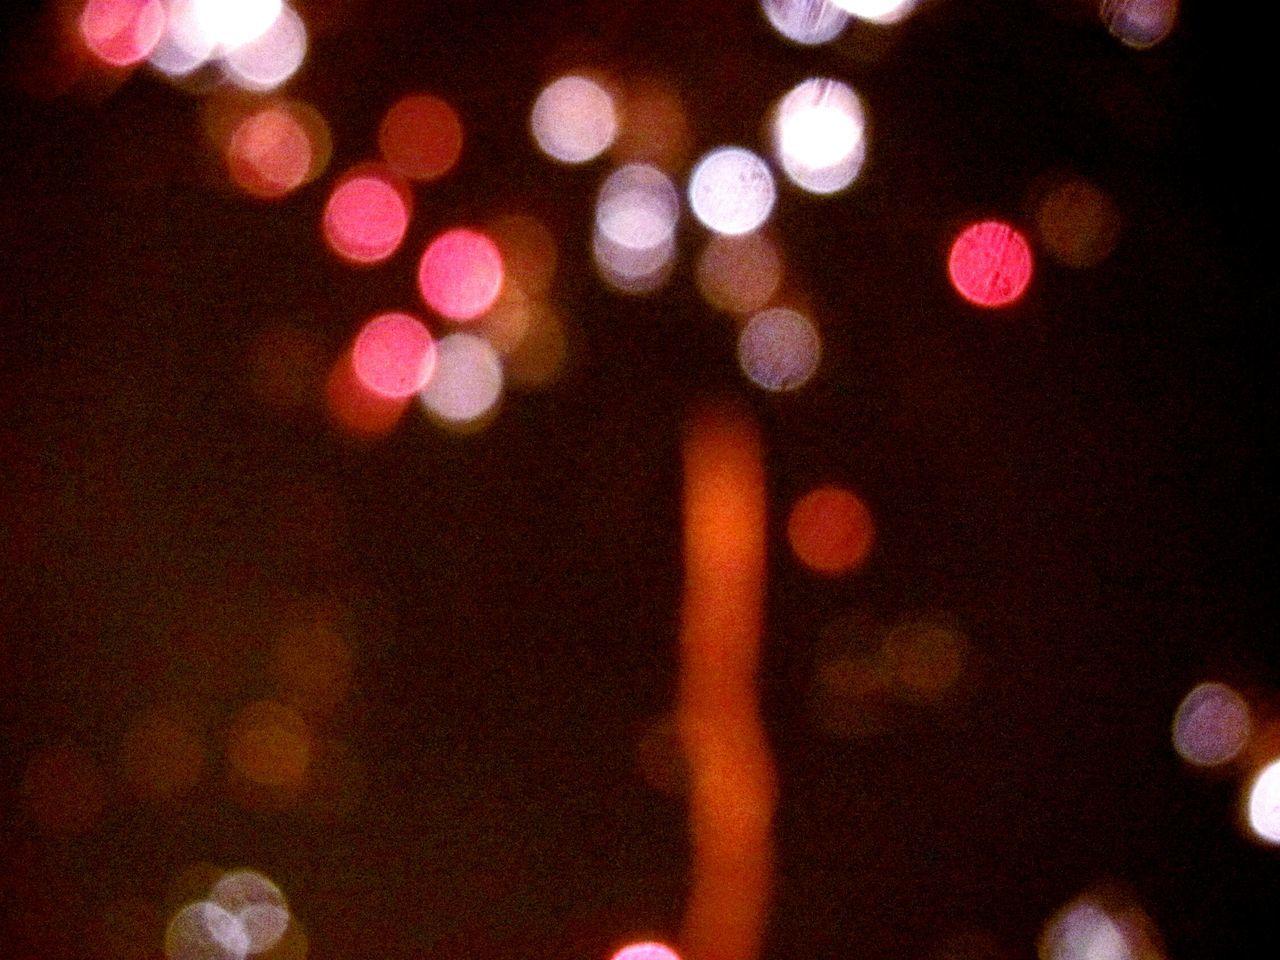 Fireworks Colorful Taking Photos NewYear Taking Photos Light Bokeh Bokeh Photography Abstract Bokeheffect Bokeh Lights Bokeh Balls Drops Pink Color Art Wallpaper